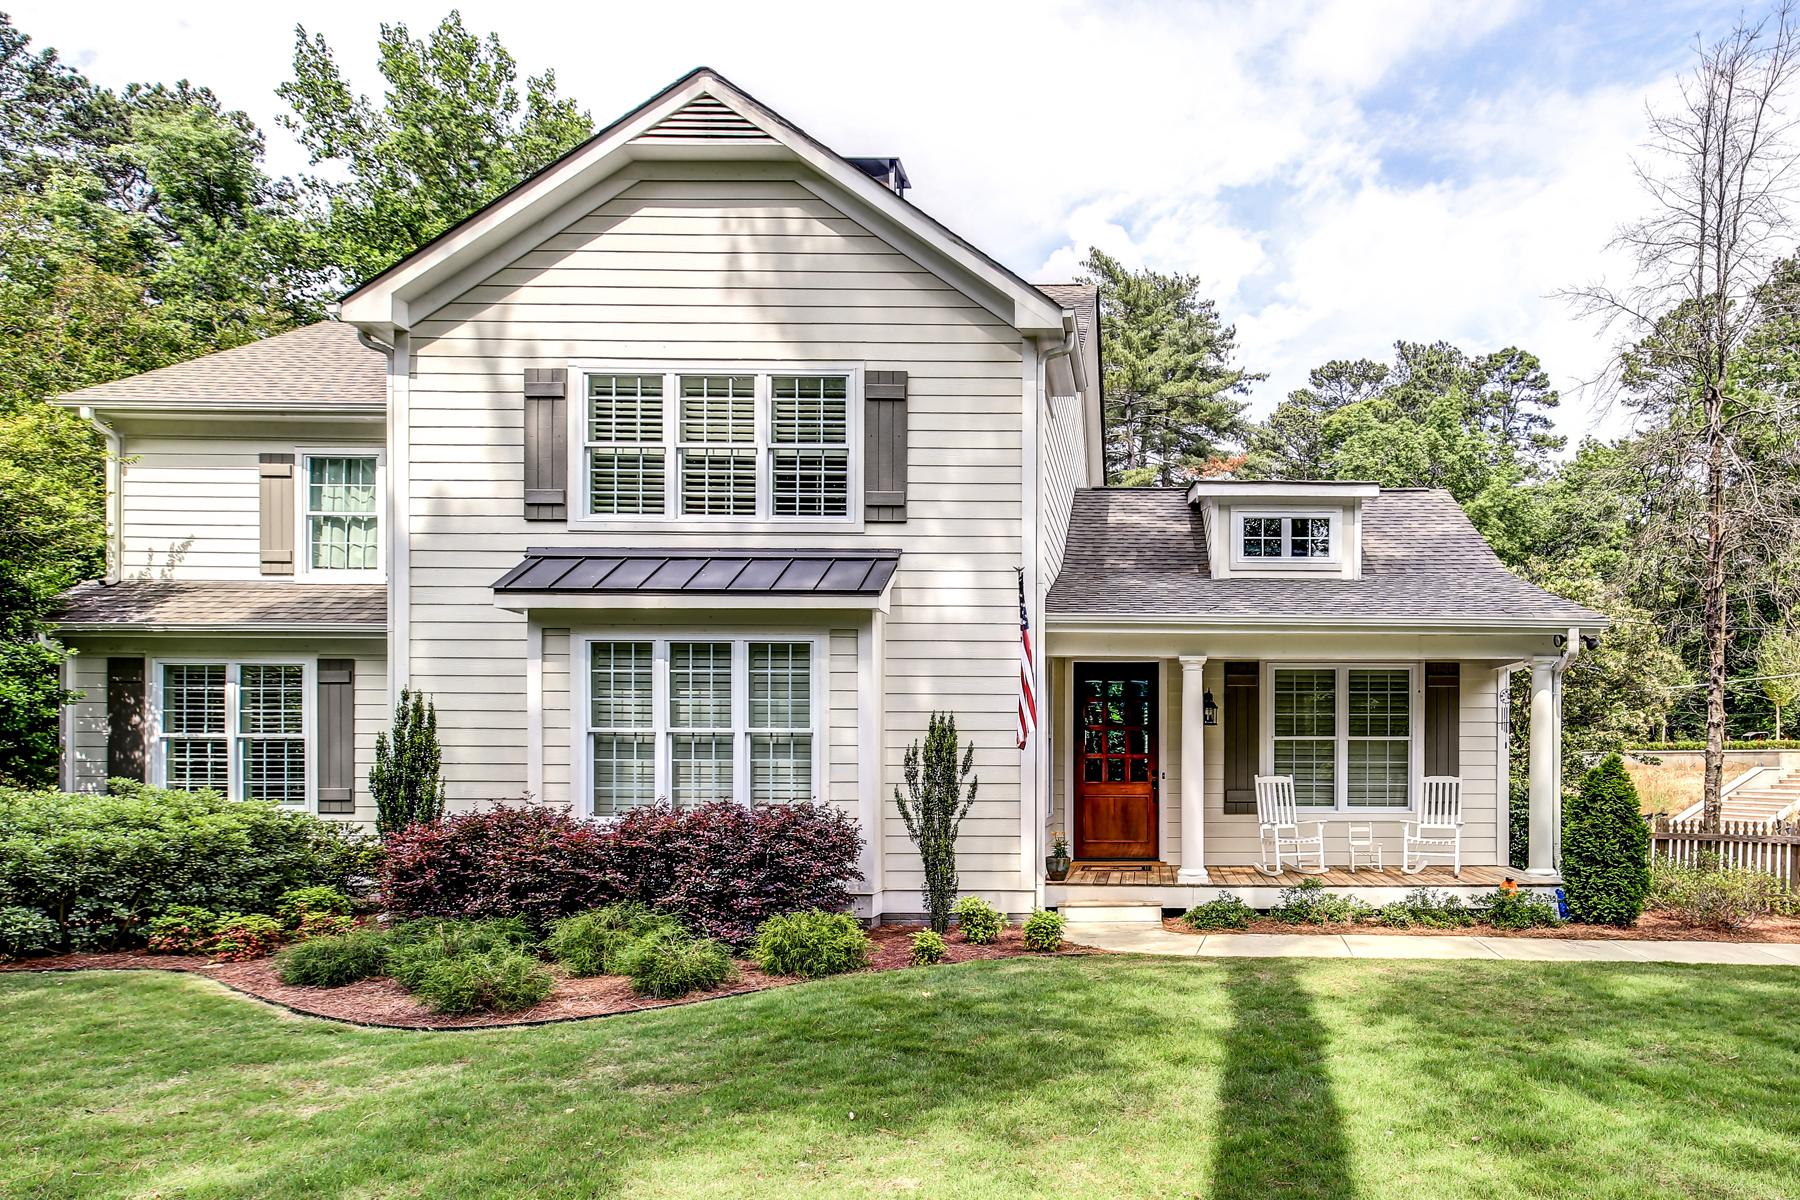 Single Family Home for Sale at Custom Built Beauty 4264 Peachtree Dunwoody Road NE Buckhead, Atlanta, Georgia, 30342 United States